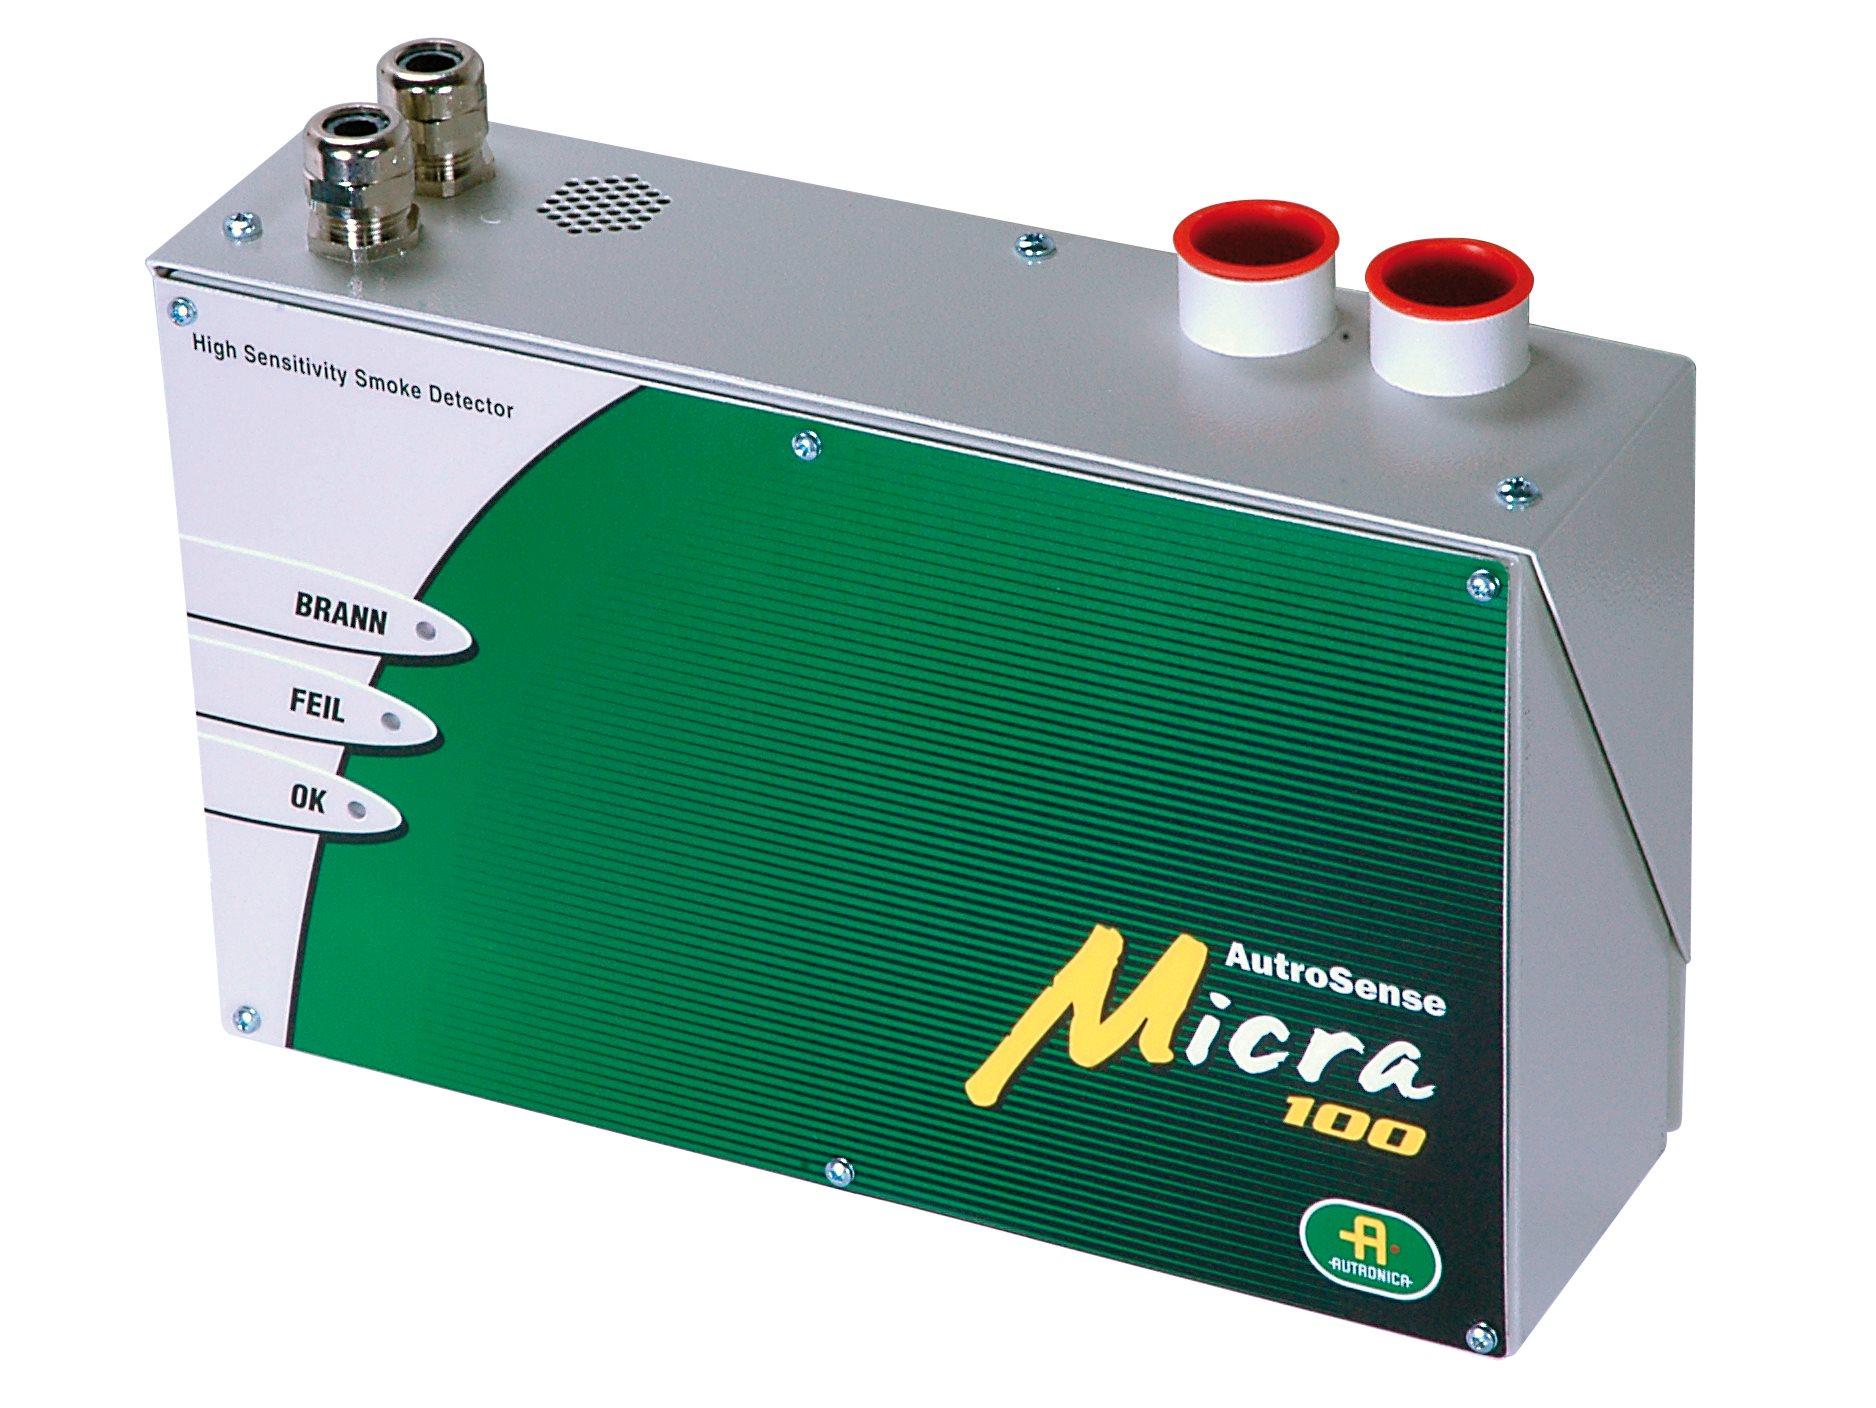 AutroSense Micra 100